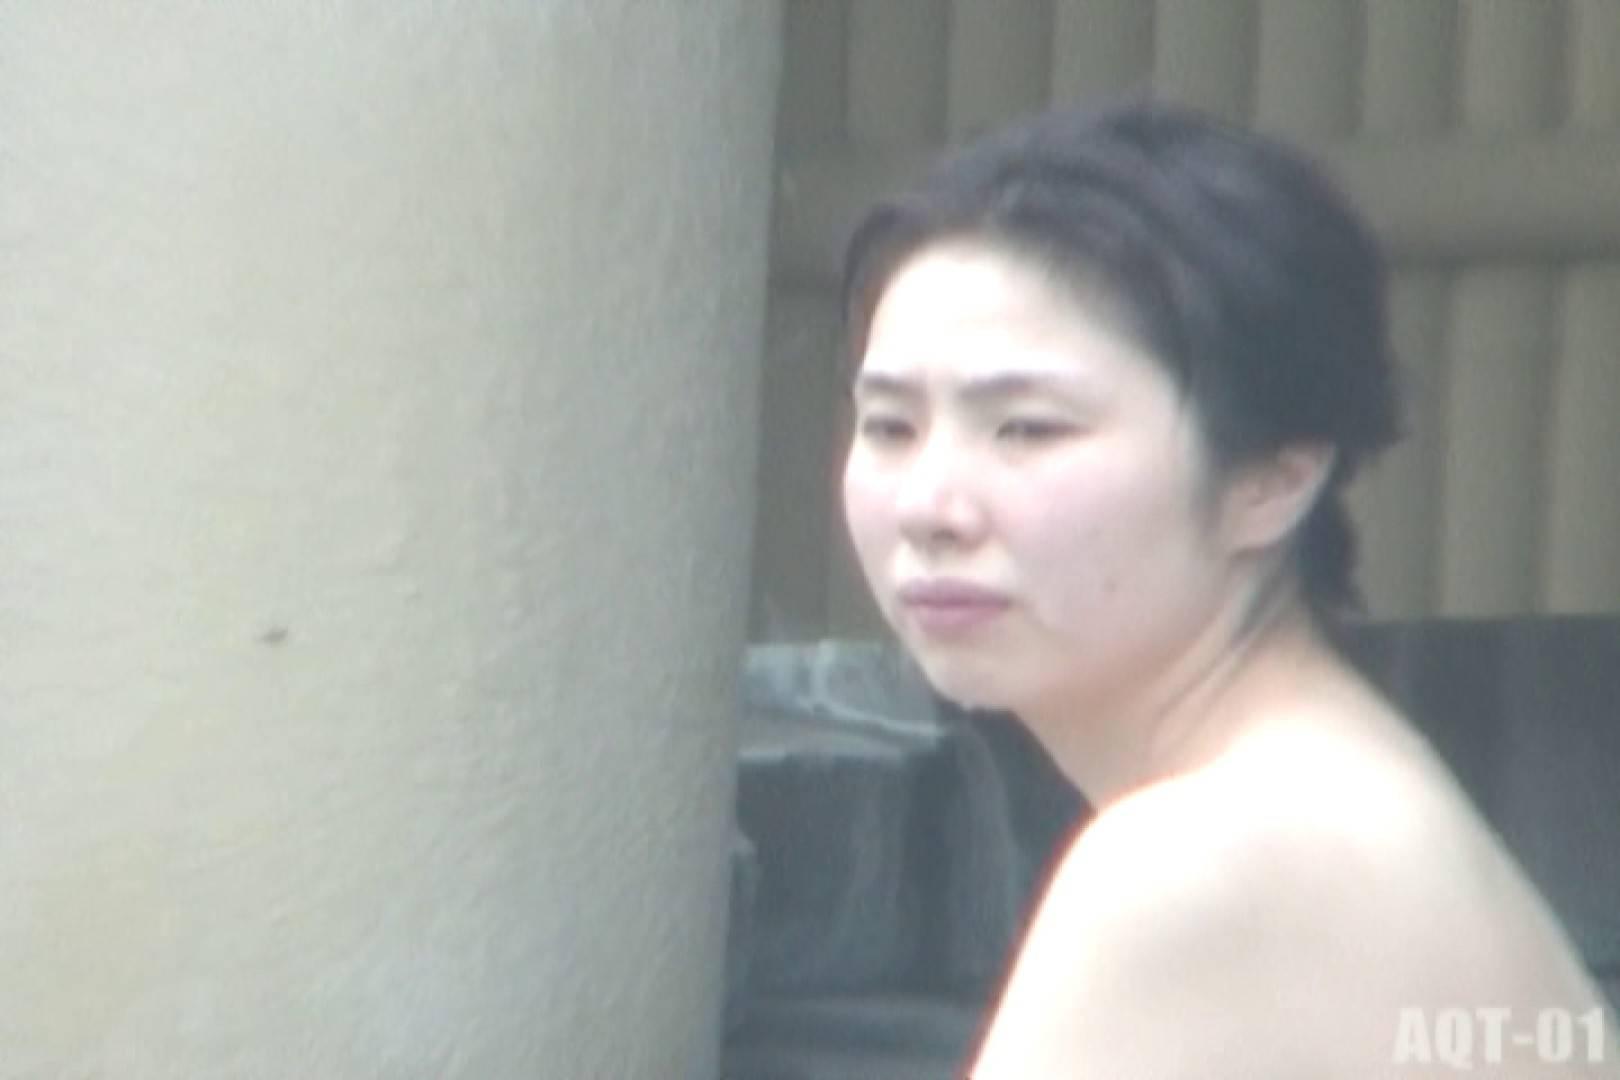 Aquaな露天風呂Vol.717 露天風呂編 | 盗撮シリーズ  111PIX 83